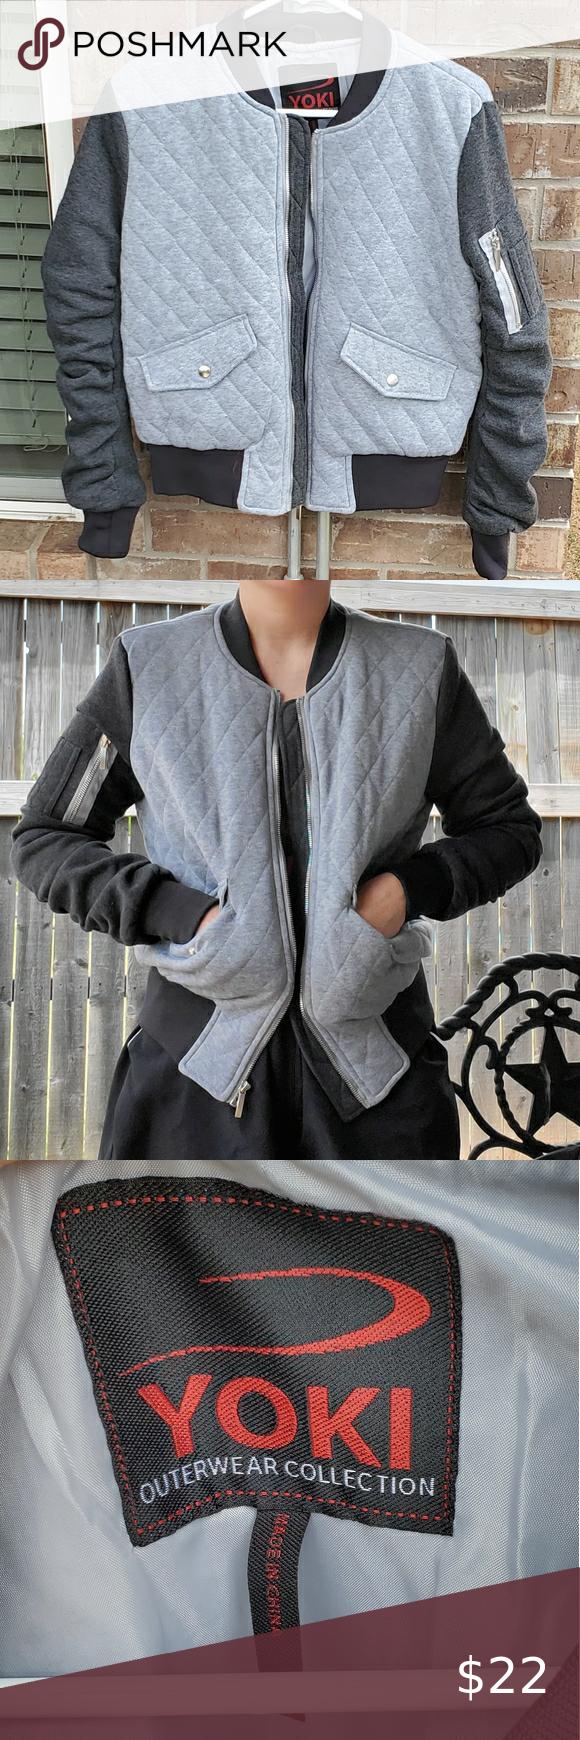 Yoki Outerwear Collection Jacket Black Leather Bomber Jacket Girls Winter Jackets Girls Peacoat [ 1740 x 580 Pixel ]